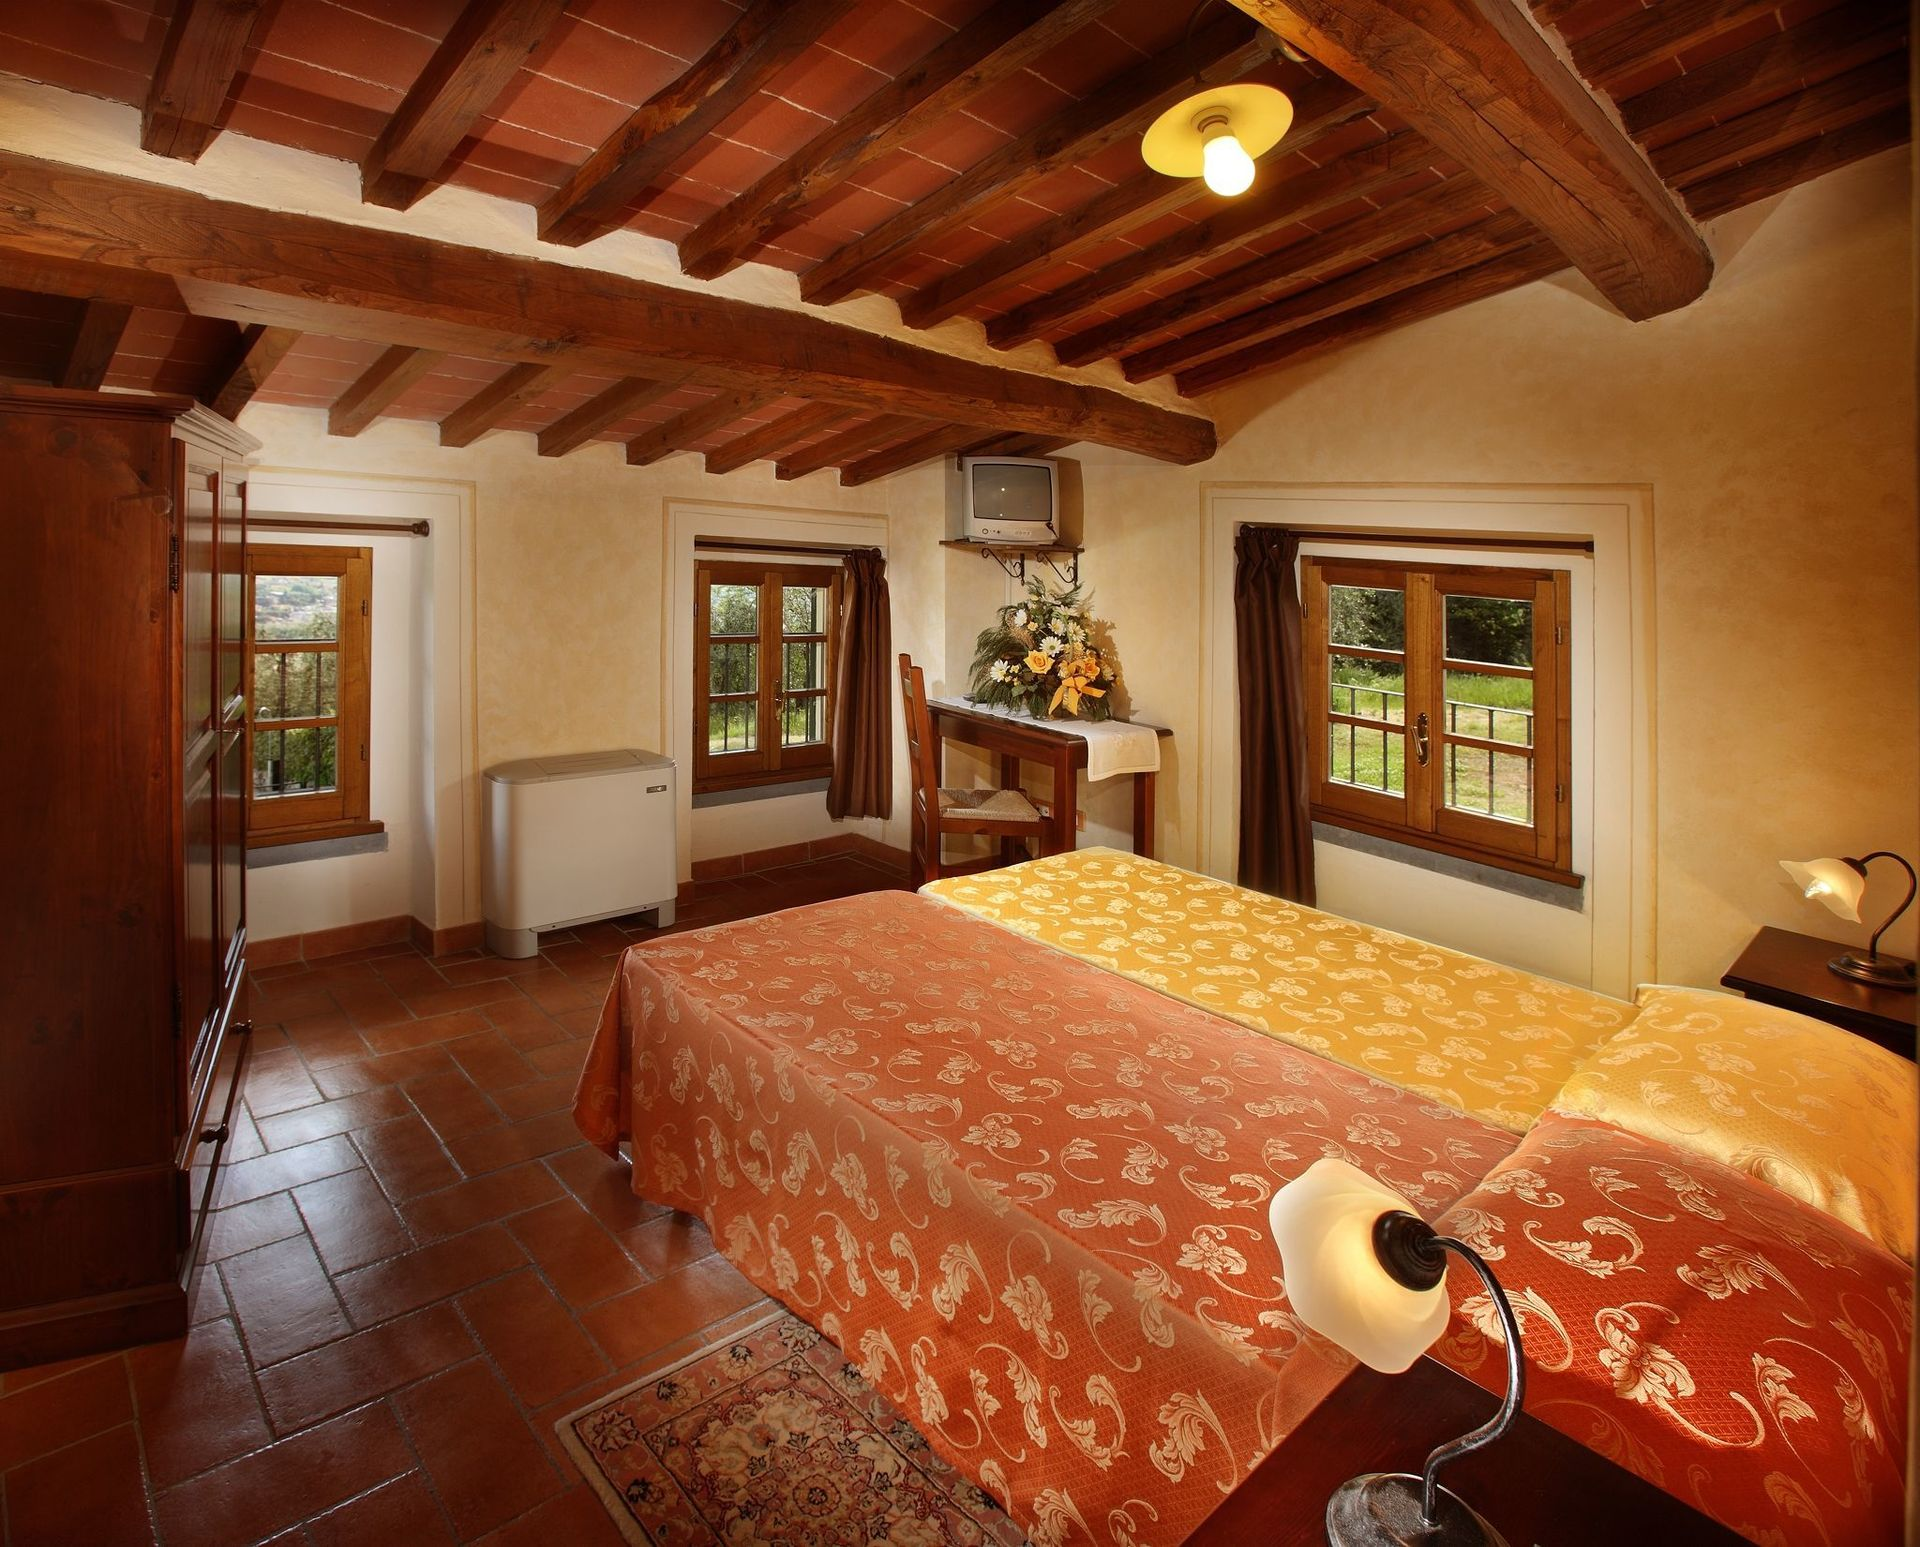 Villa le ferrette location de vacances couchages 23 dans 11 chambres montecatini alto - Villa de vacances vogue interiors ...